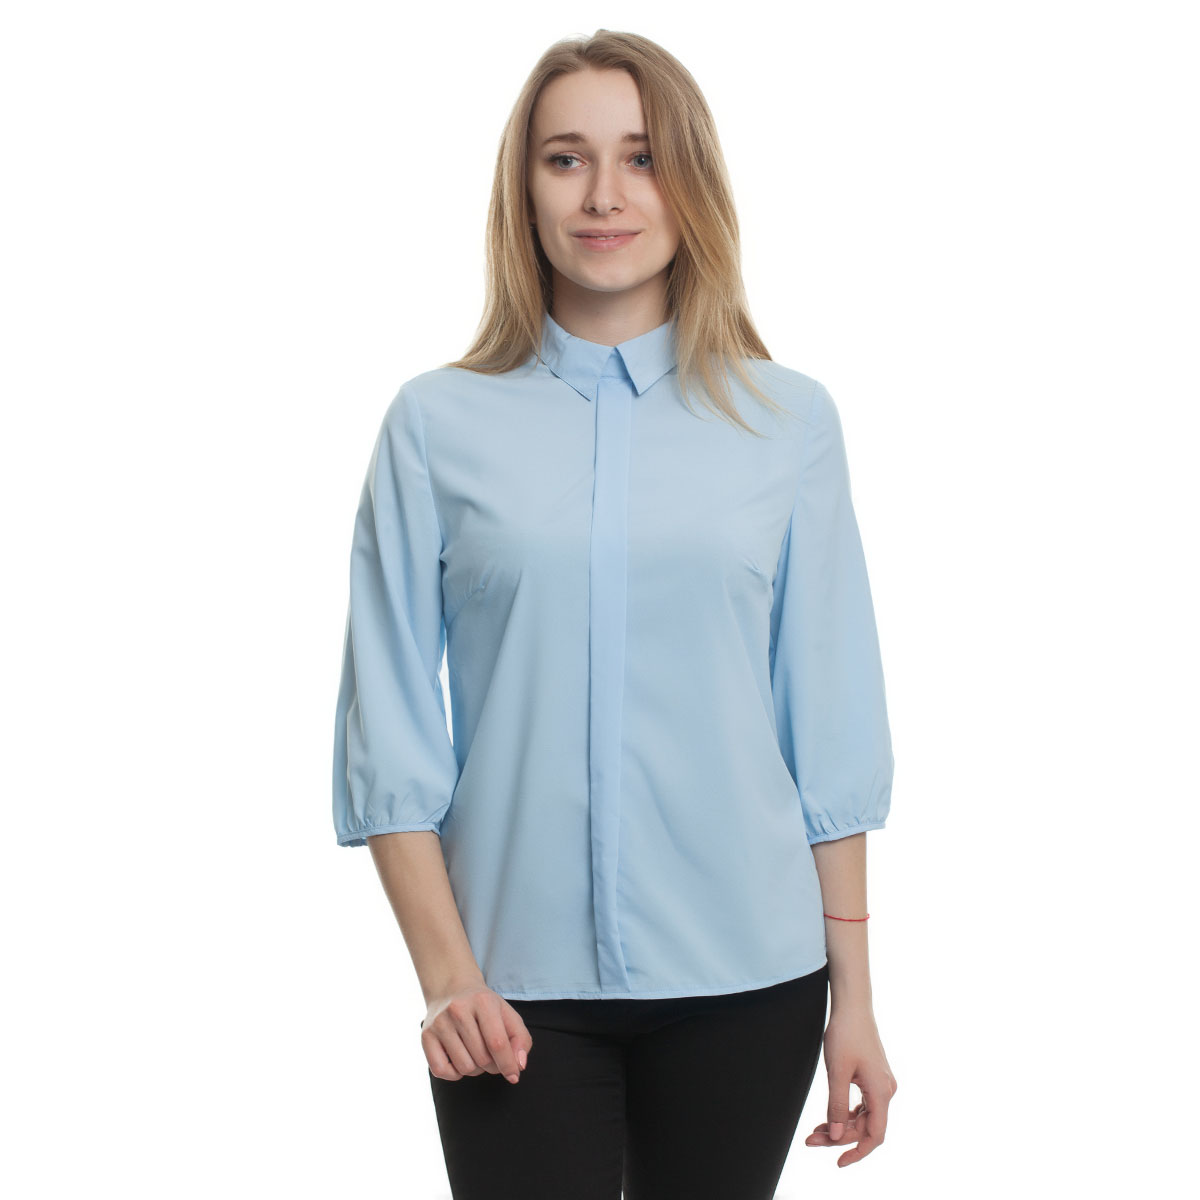 Фото - Блузка Sevenext, 262 блузка женская oodji collection цвет светло зеленый белый 21412132 2b 24681 6010g размер 44 170 50 170